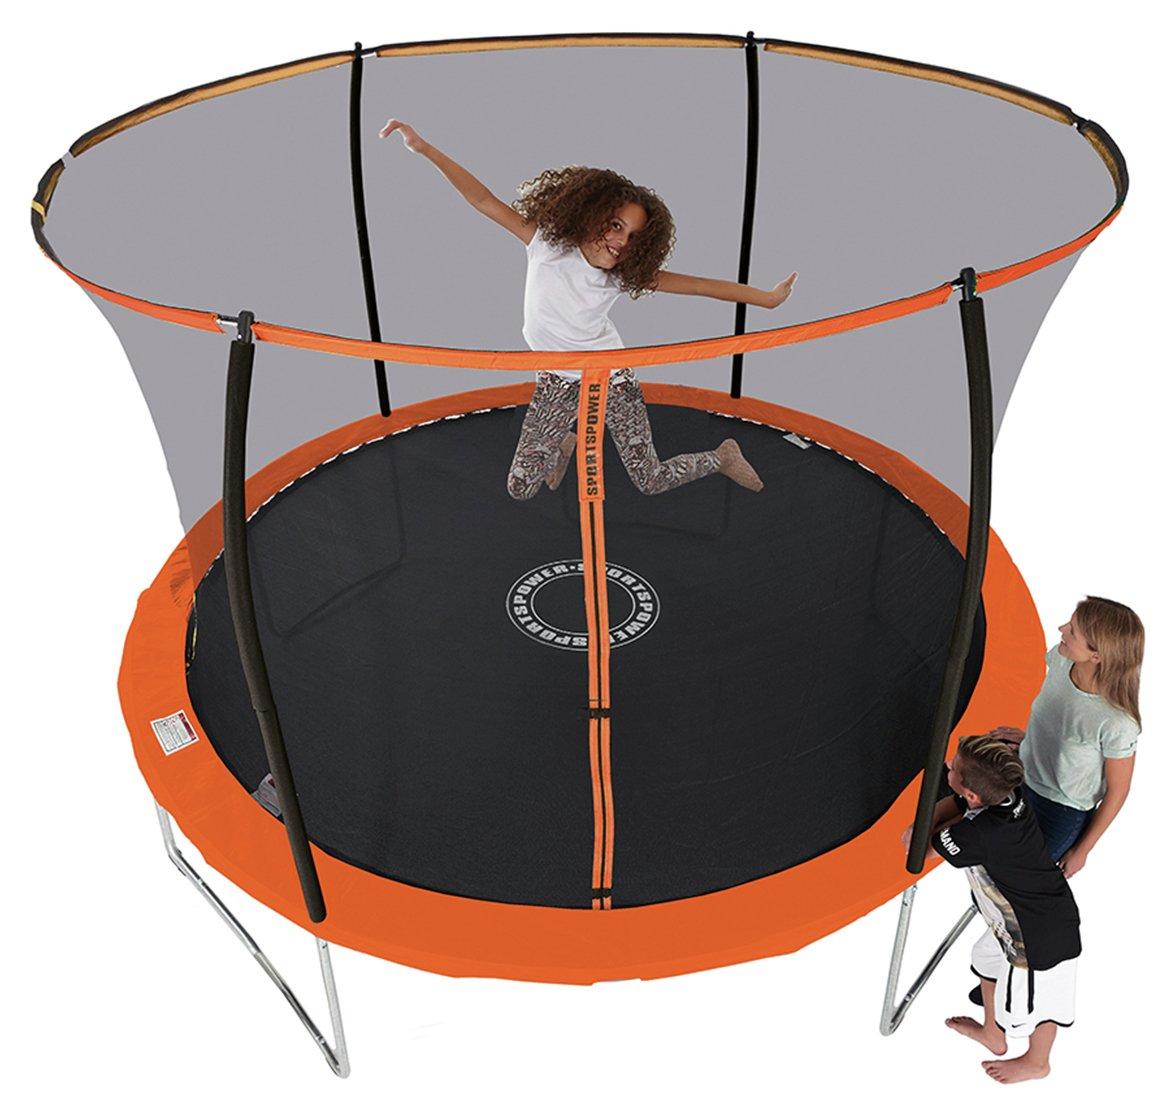 Buy Sportspower Trampoline Folding Enclosure